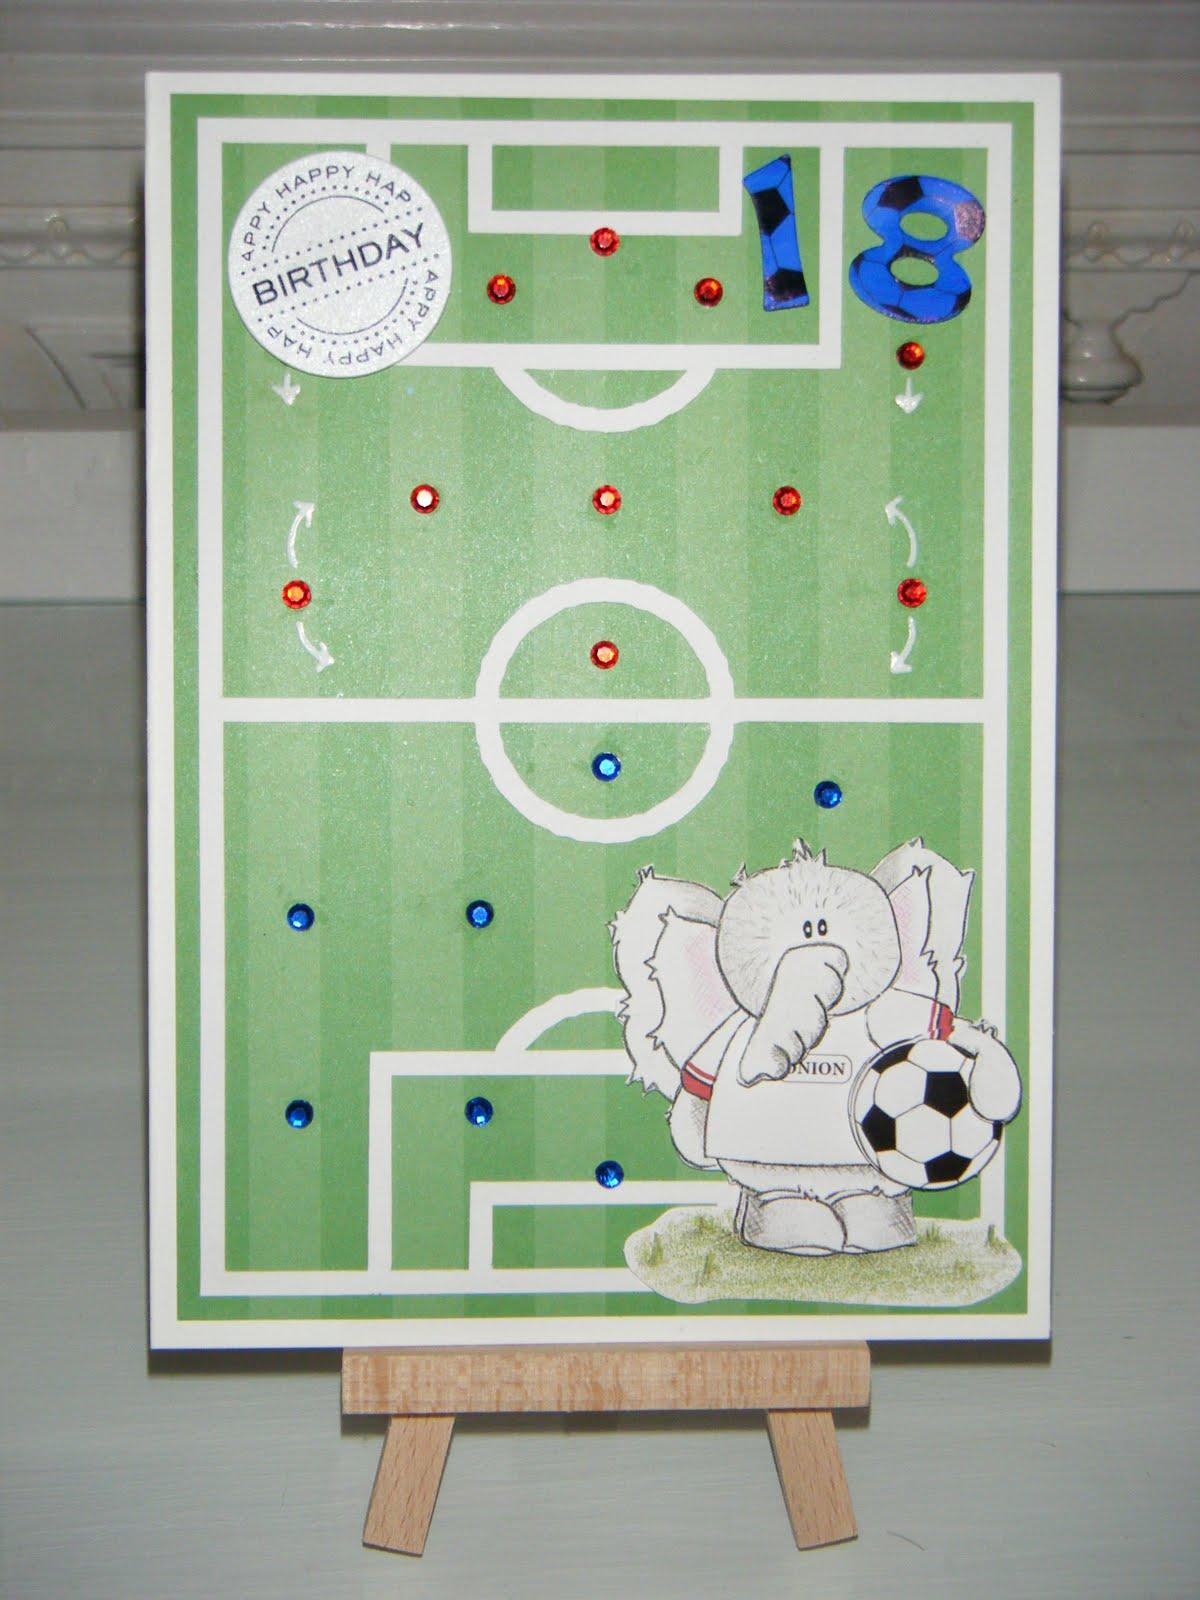 http://3.bp.blogspot.com/_Xgk0SKJVuVM/S8YrBsuYhHI/AAAAAAAAALQ/Je34MB0KgBY/s1600/18th+Birthday+Football+Card.JPG